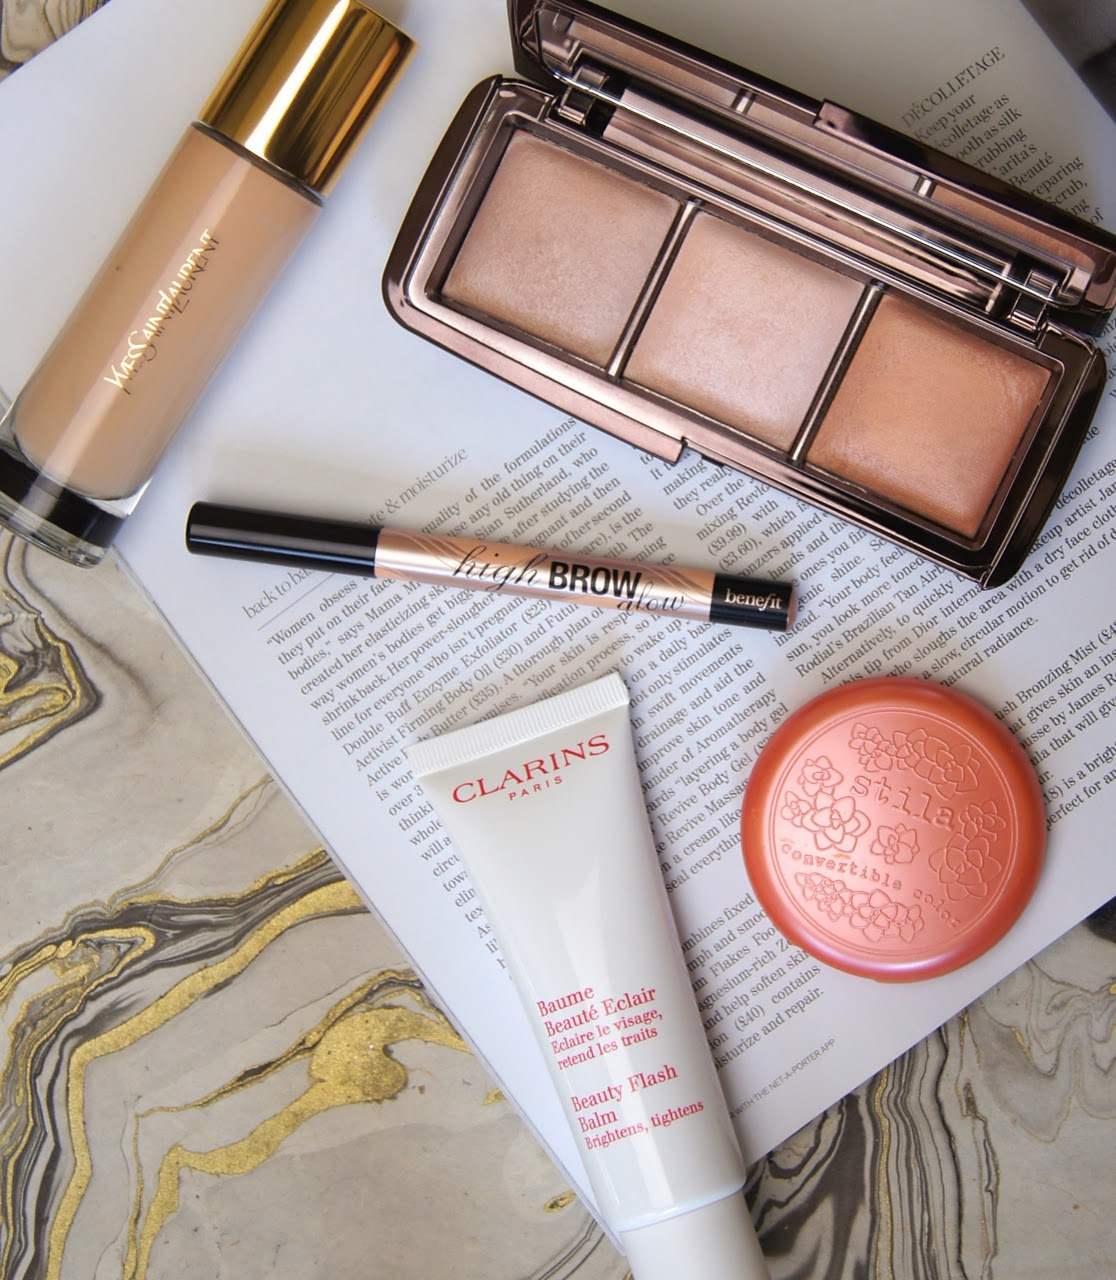 5 makeup products for glowing skin clarins primer moisturiser ysl foundation hourglass powder still cream blush benefit highlight